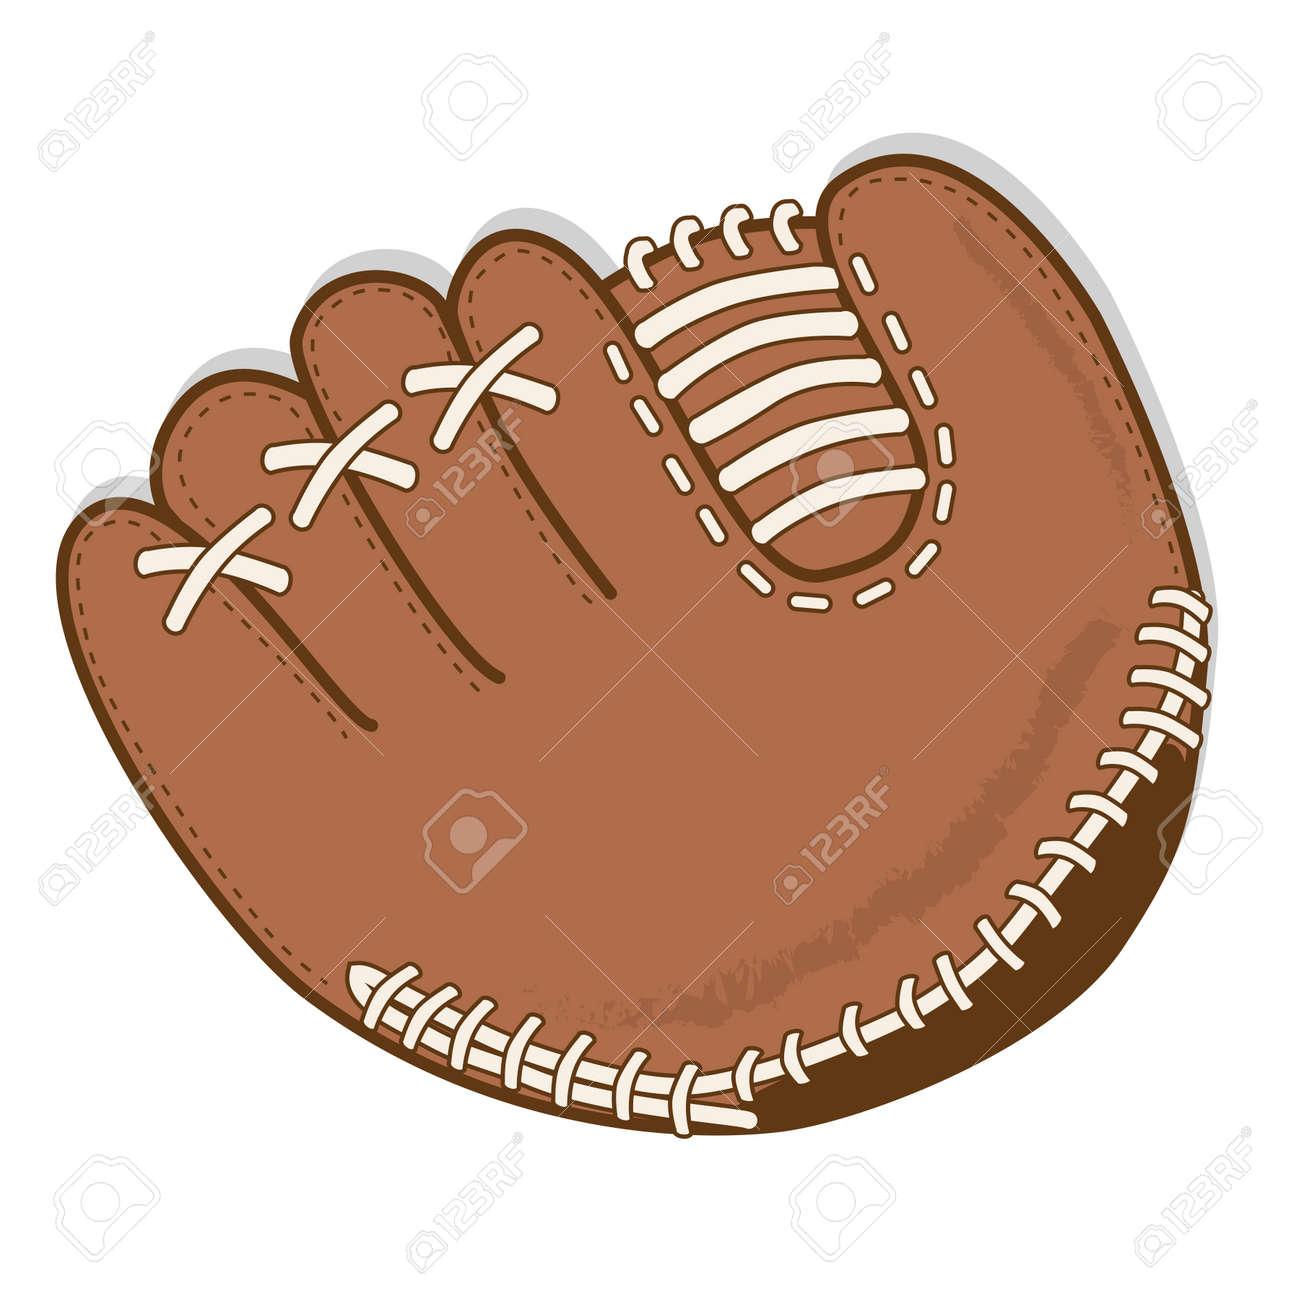 baseball glove or mitt vector on a transparent background royalty rh 123rf com Baseball Clip Art baseball mitt clipart